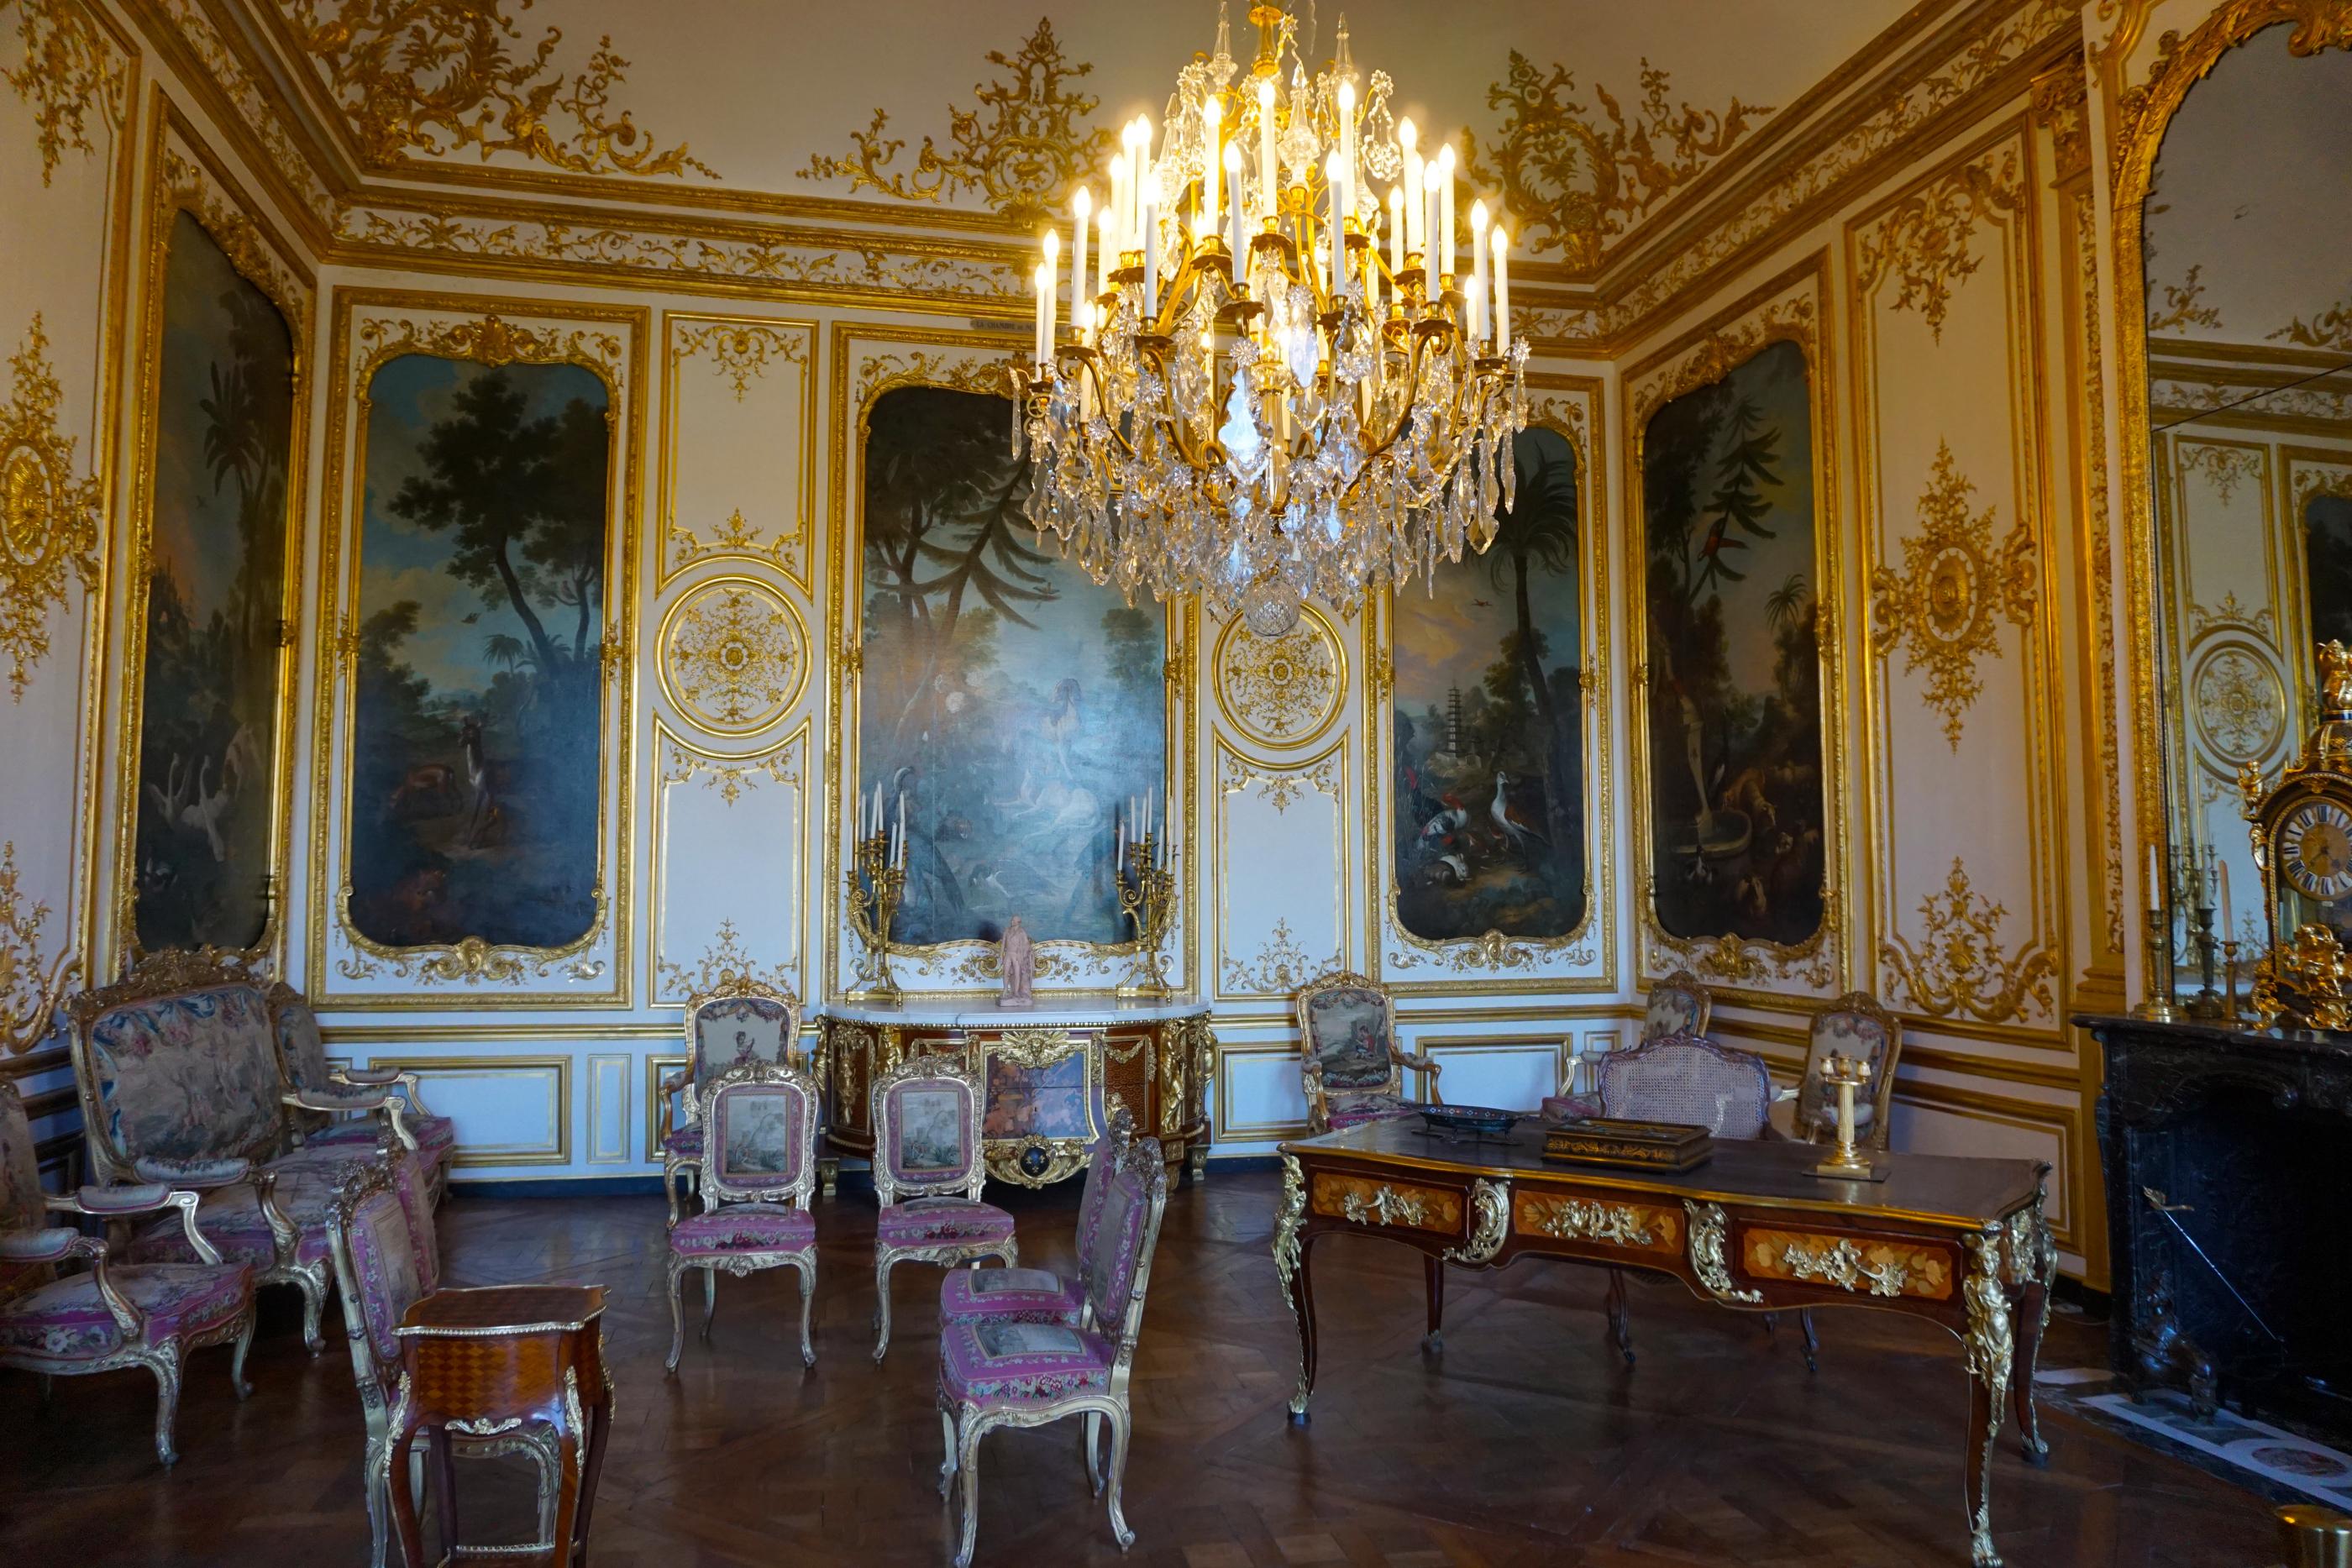 I Prefer Paris Day in Chantilly and Auberge du Jeu de Paume Hotel